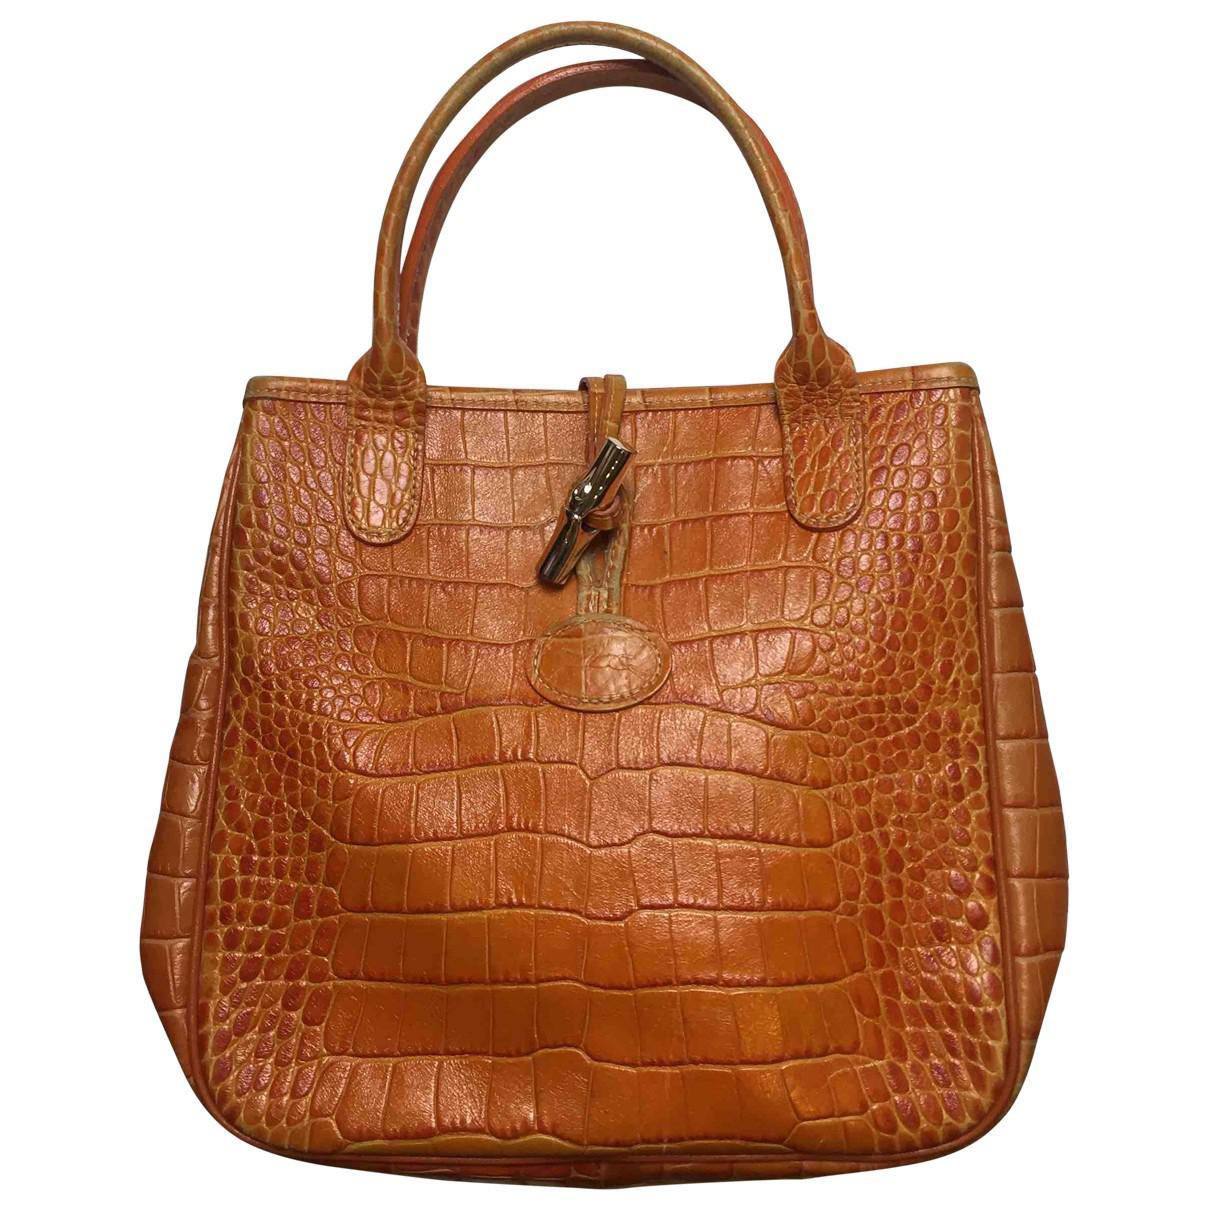 0248c93b8264 Lyst - Longchamp Roseau Leather Handbag in Orange